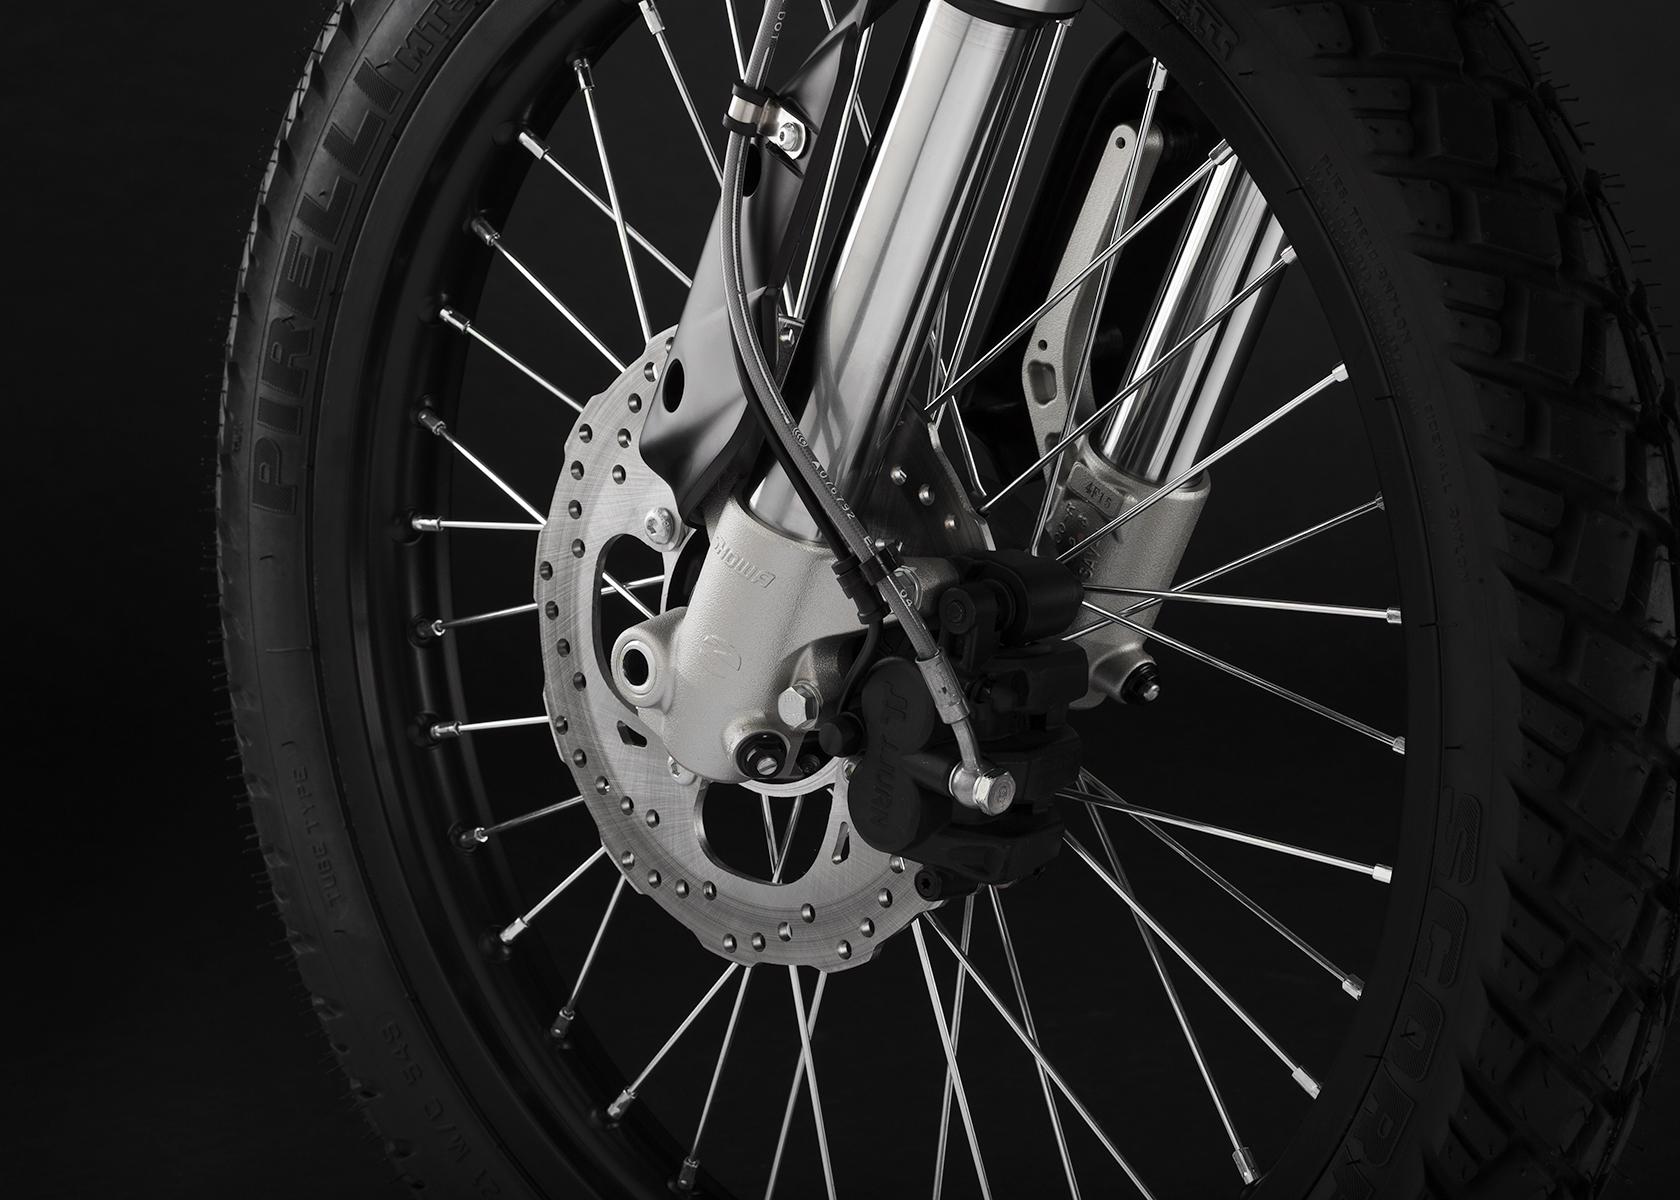 2015 Zero FX Electric Motorcycle: Front Brake